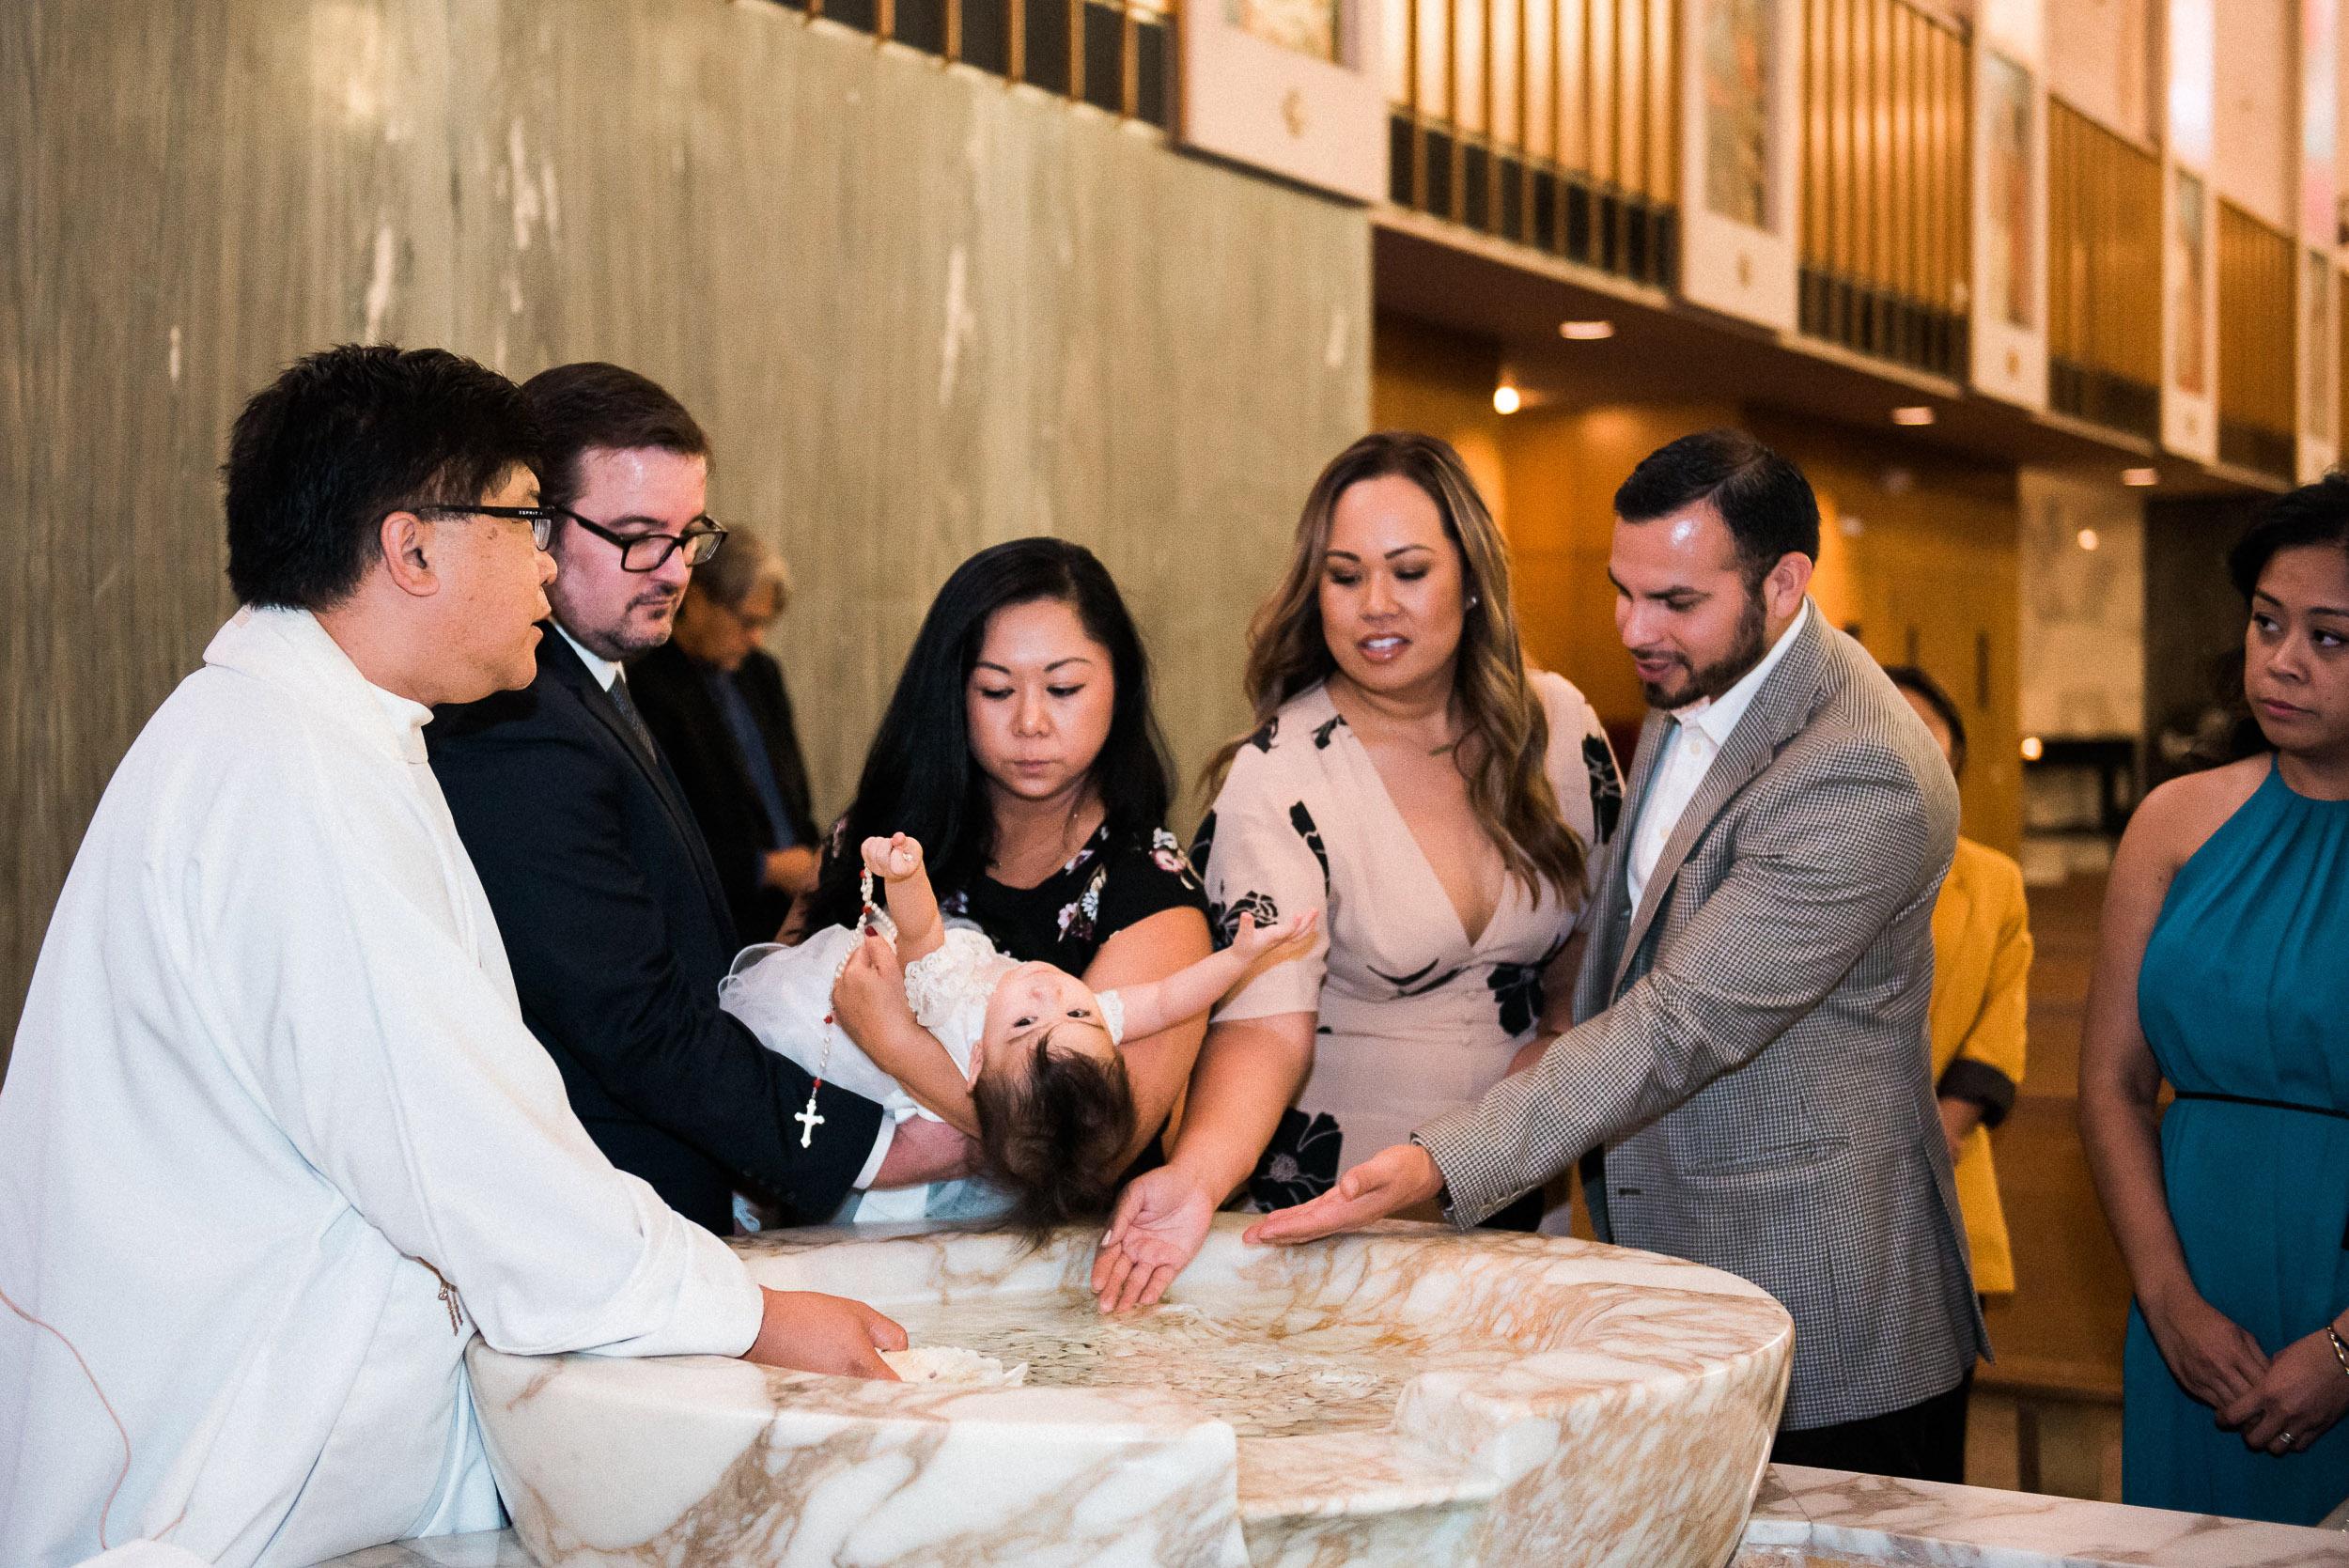 Bryan-Miraflor-Photo-Allison-Baptism-Church-20171014-0111.jpg